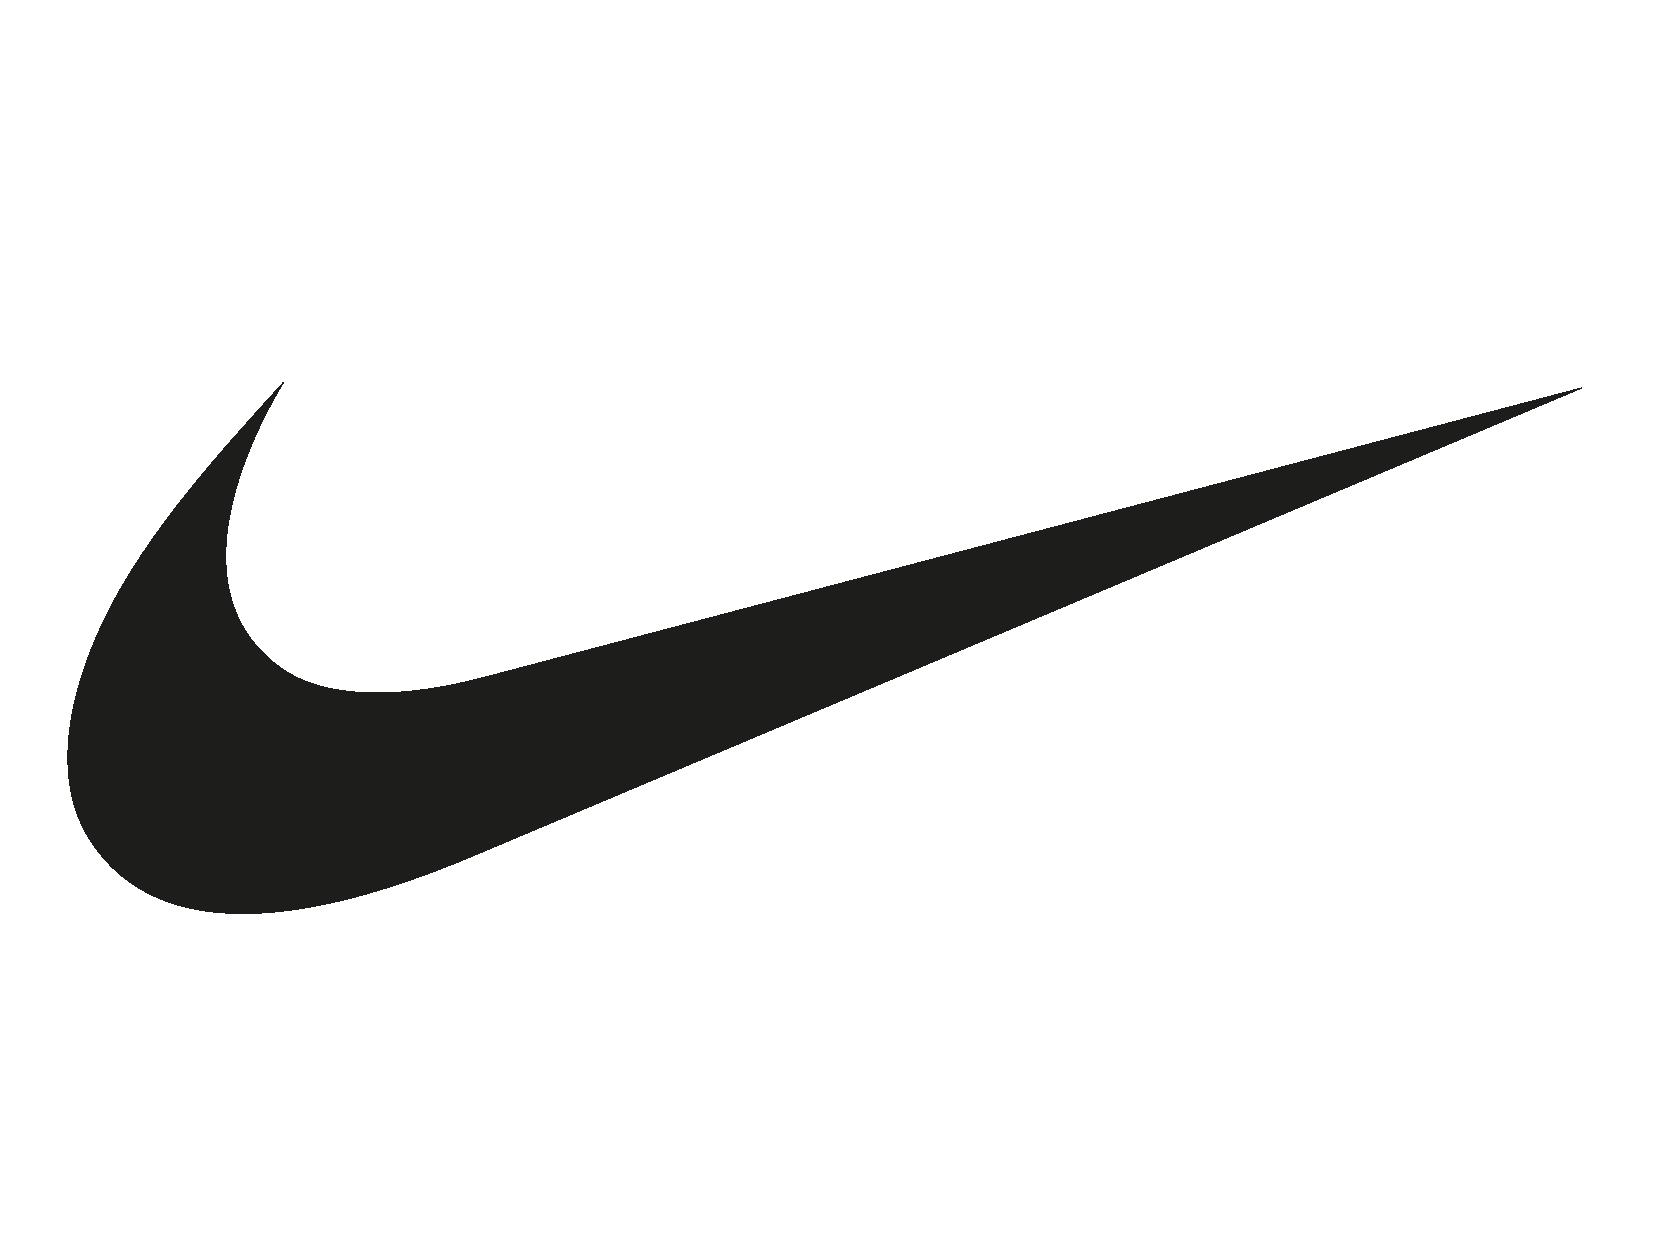 nike-Swoosh-vector-logo-01